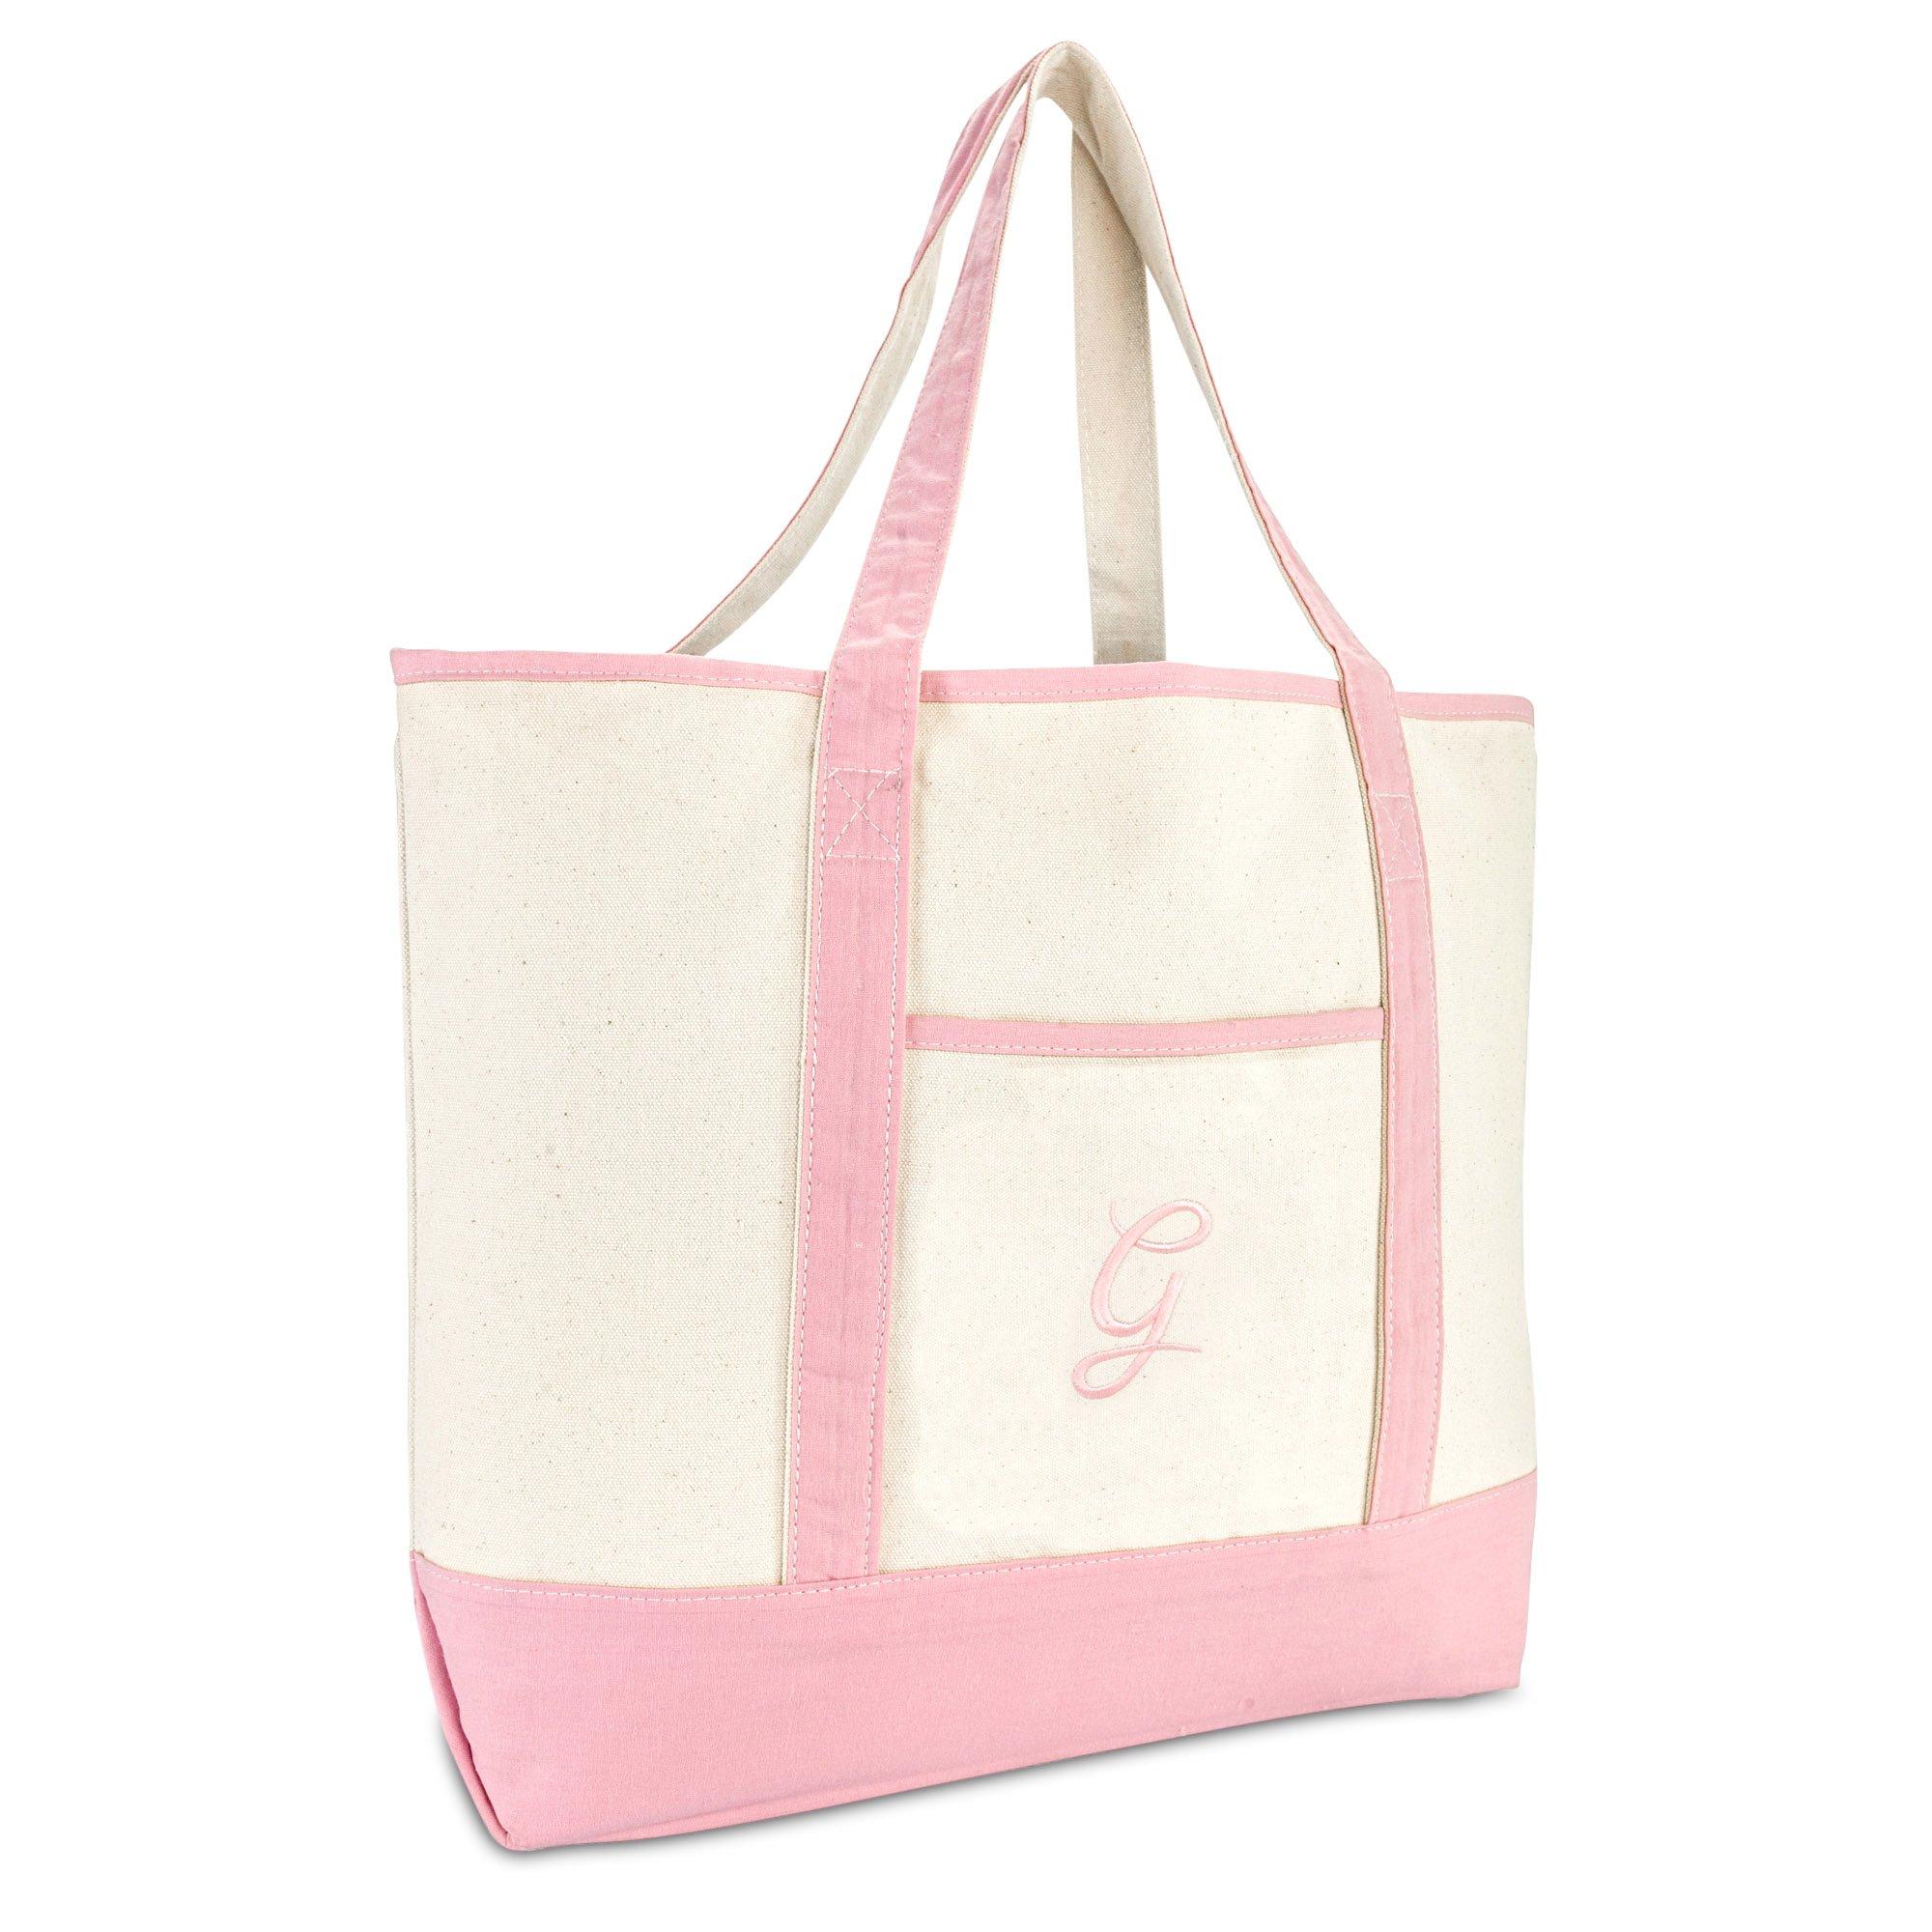 DALIX Women's Cotton Canvas Tote Bag Large Shoulder Bags Pink Monogram G by DALIX (Image #1)